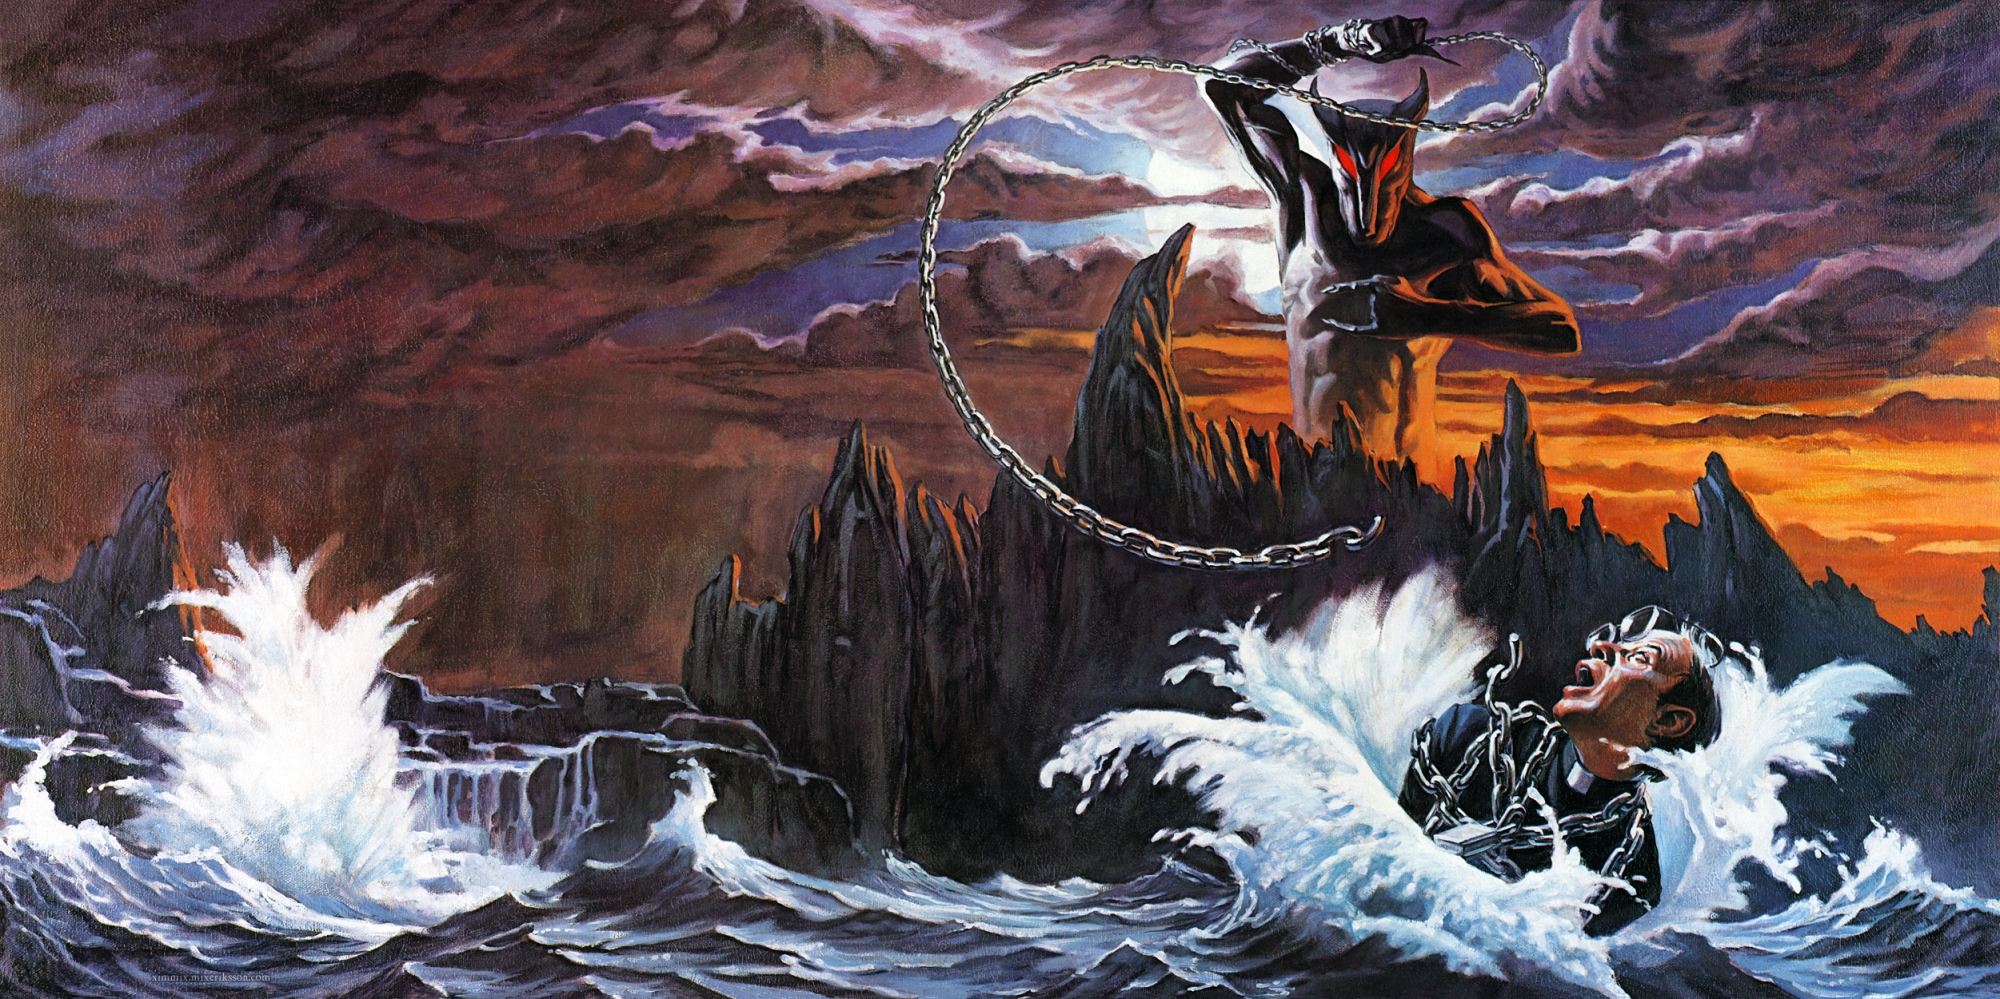 holy diver dio randy berrett 1983